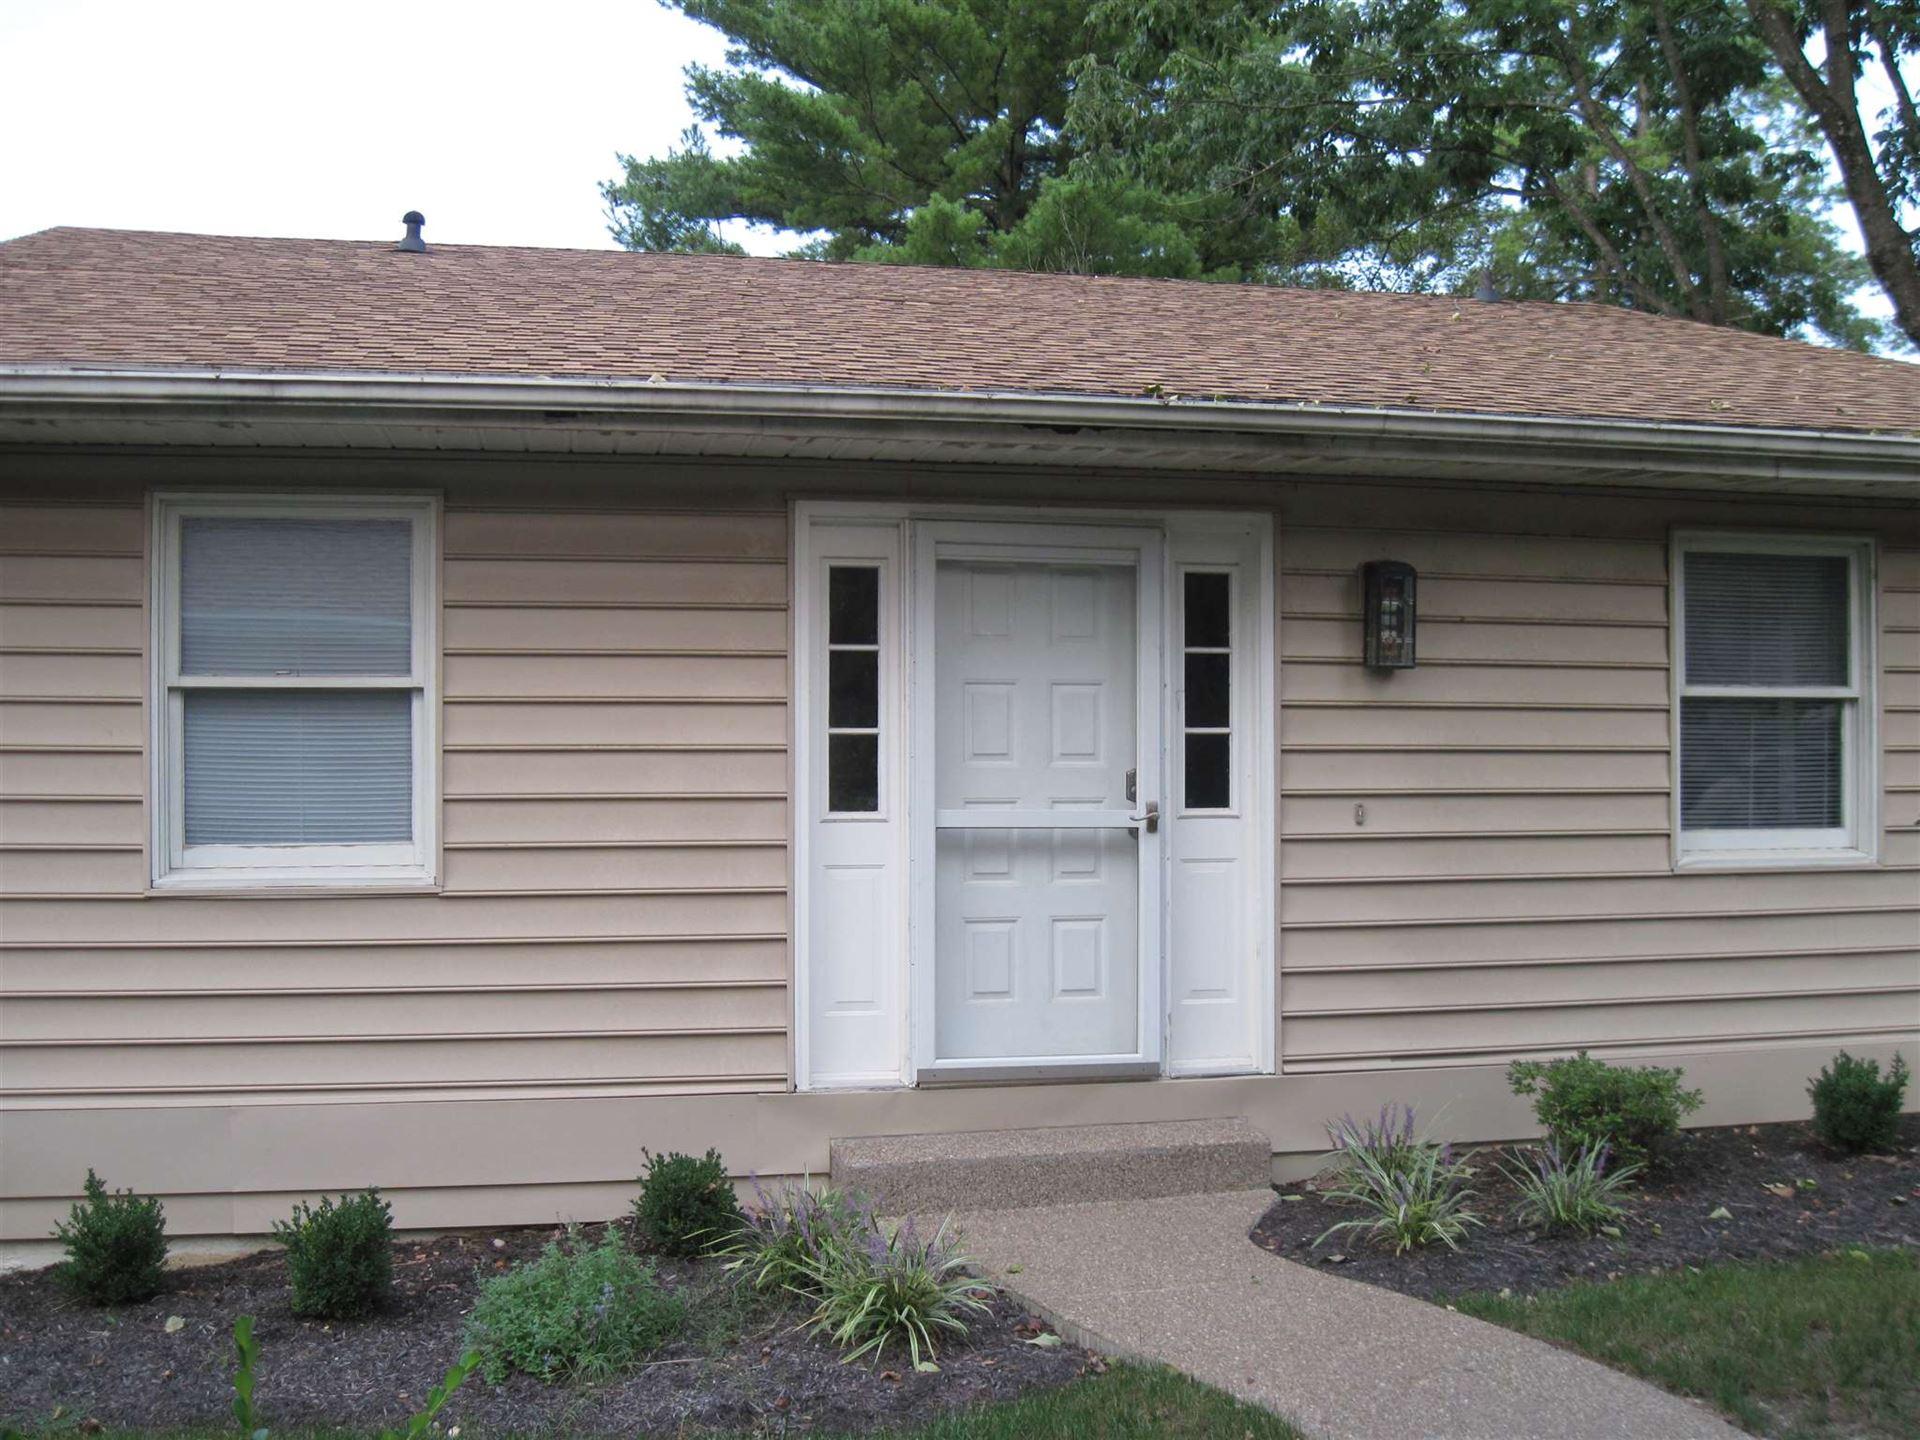 11559 Village Drive #Building 2 Apt 1, Evansville, IN 47725 - #: 202036909